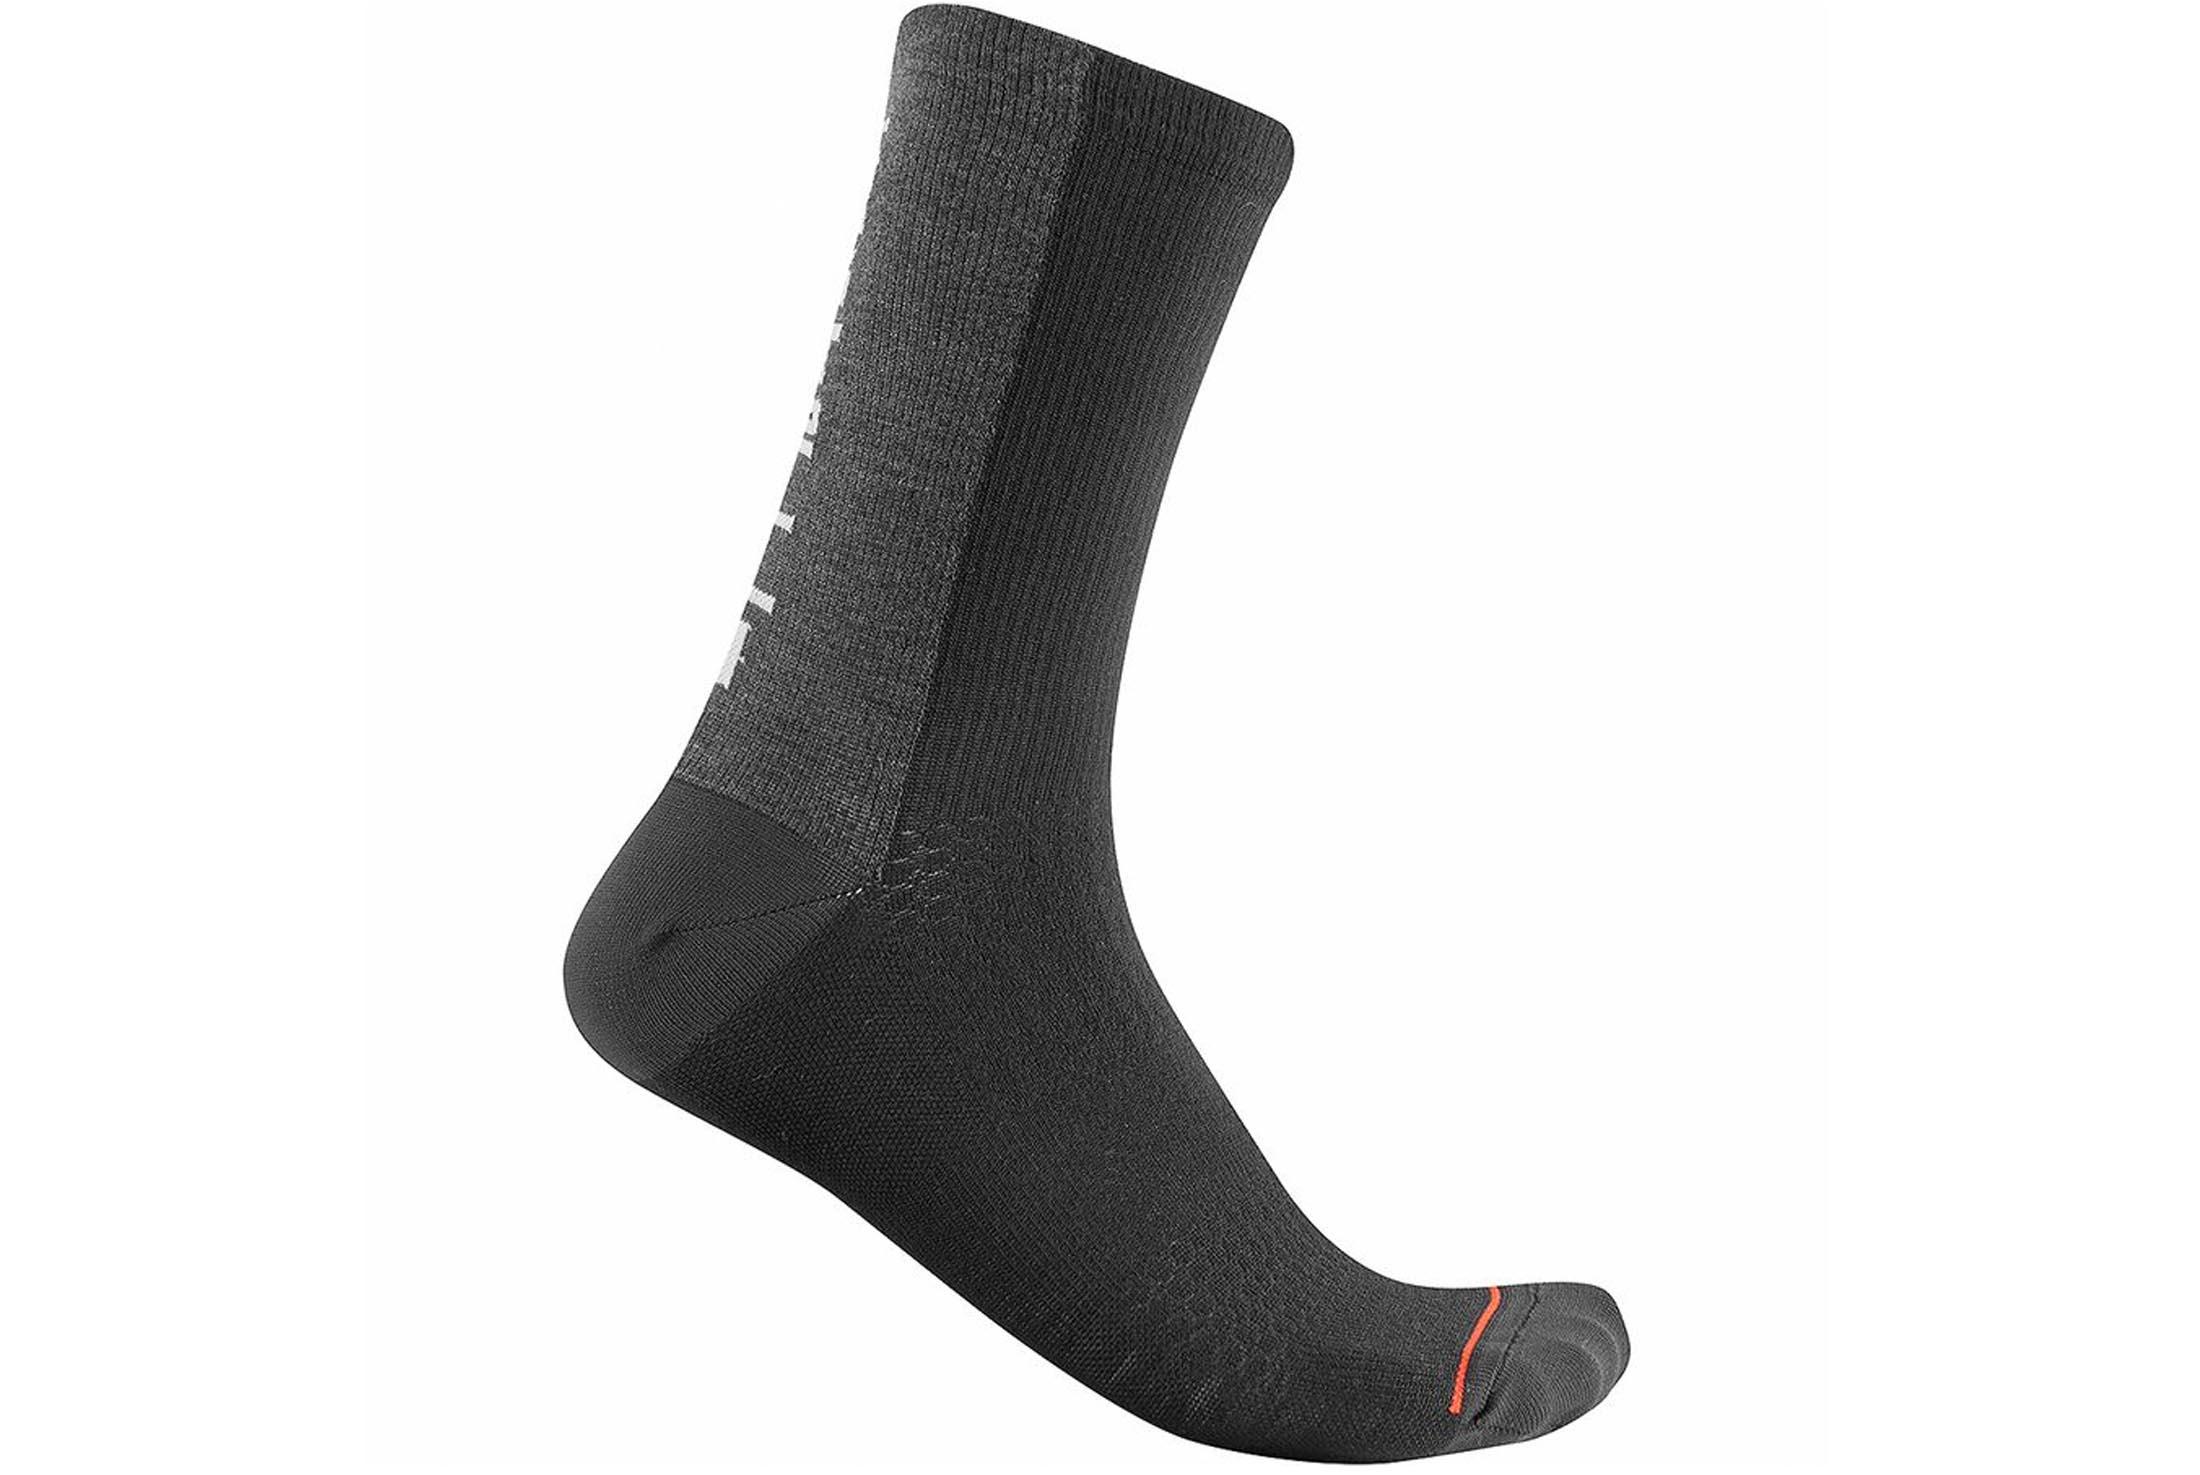 Castelli bicycle sock